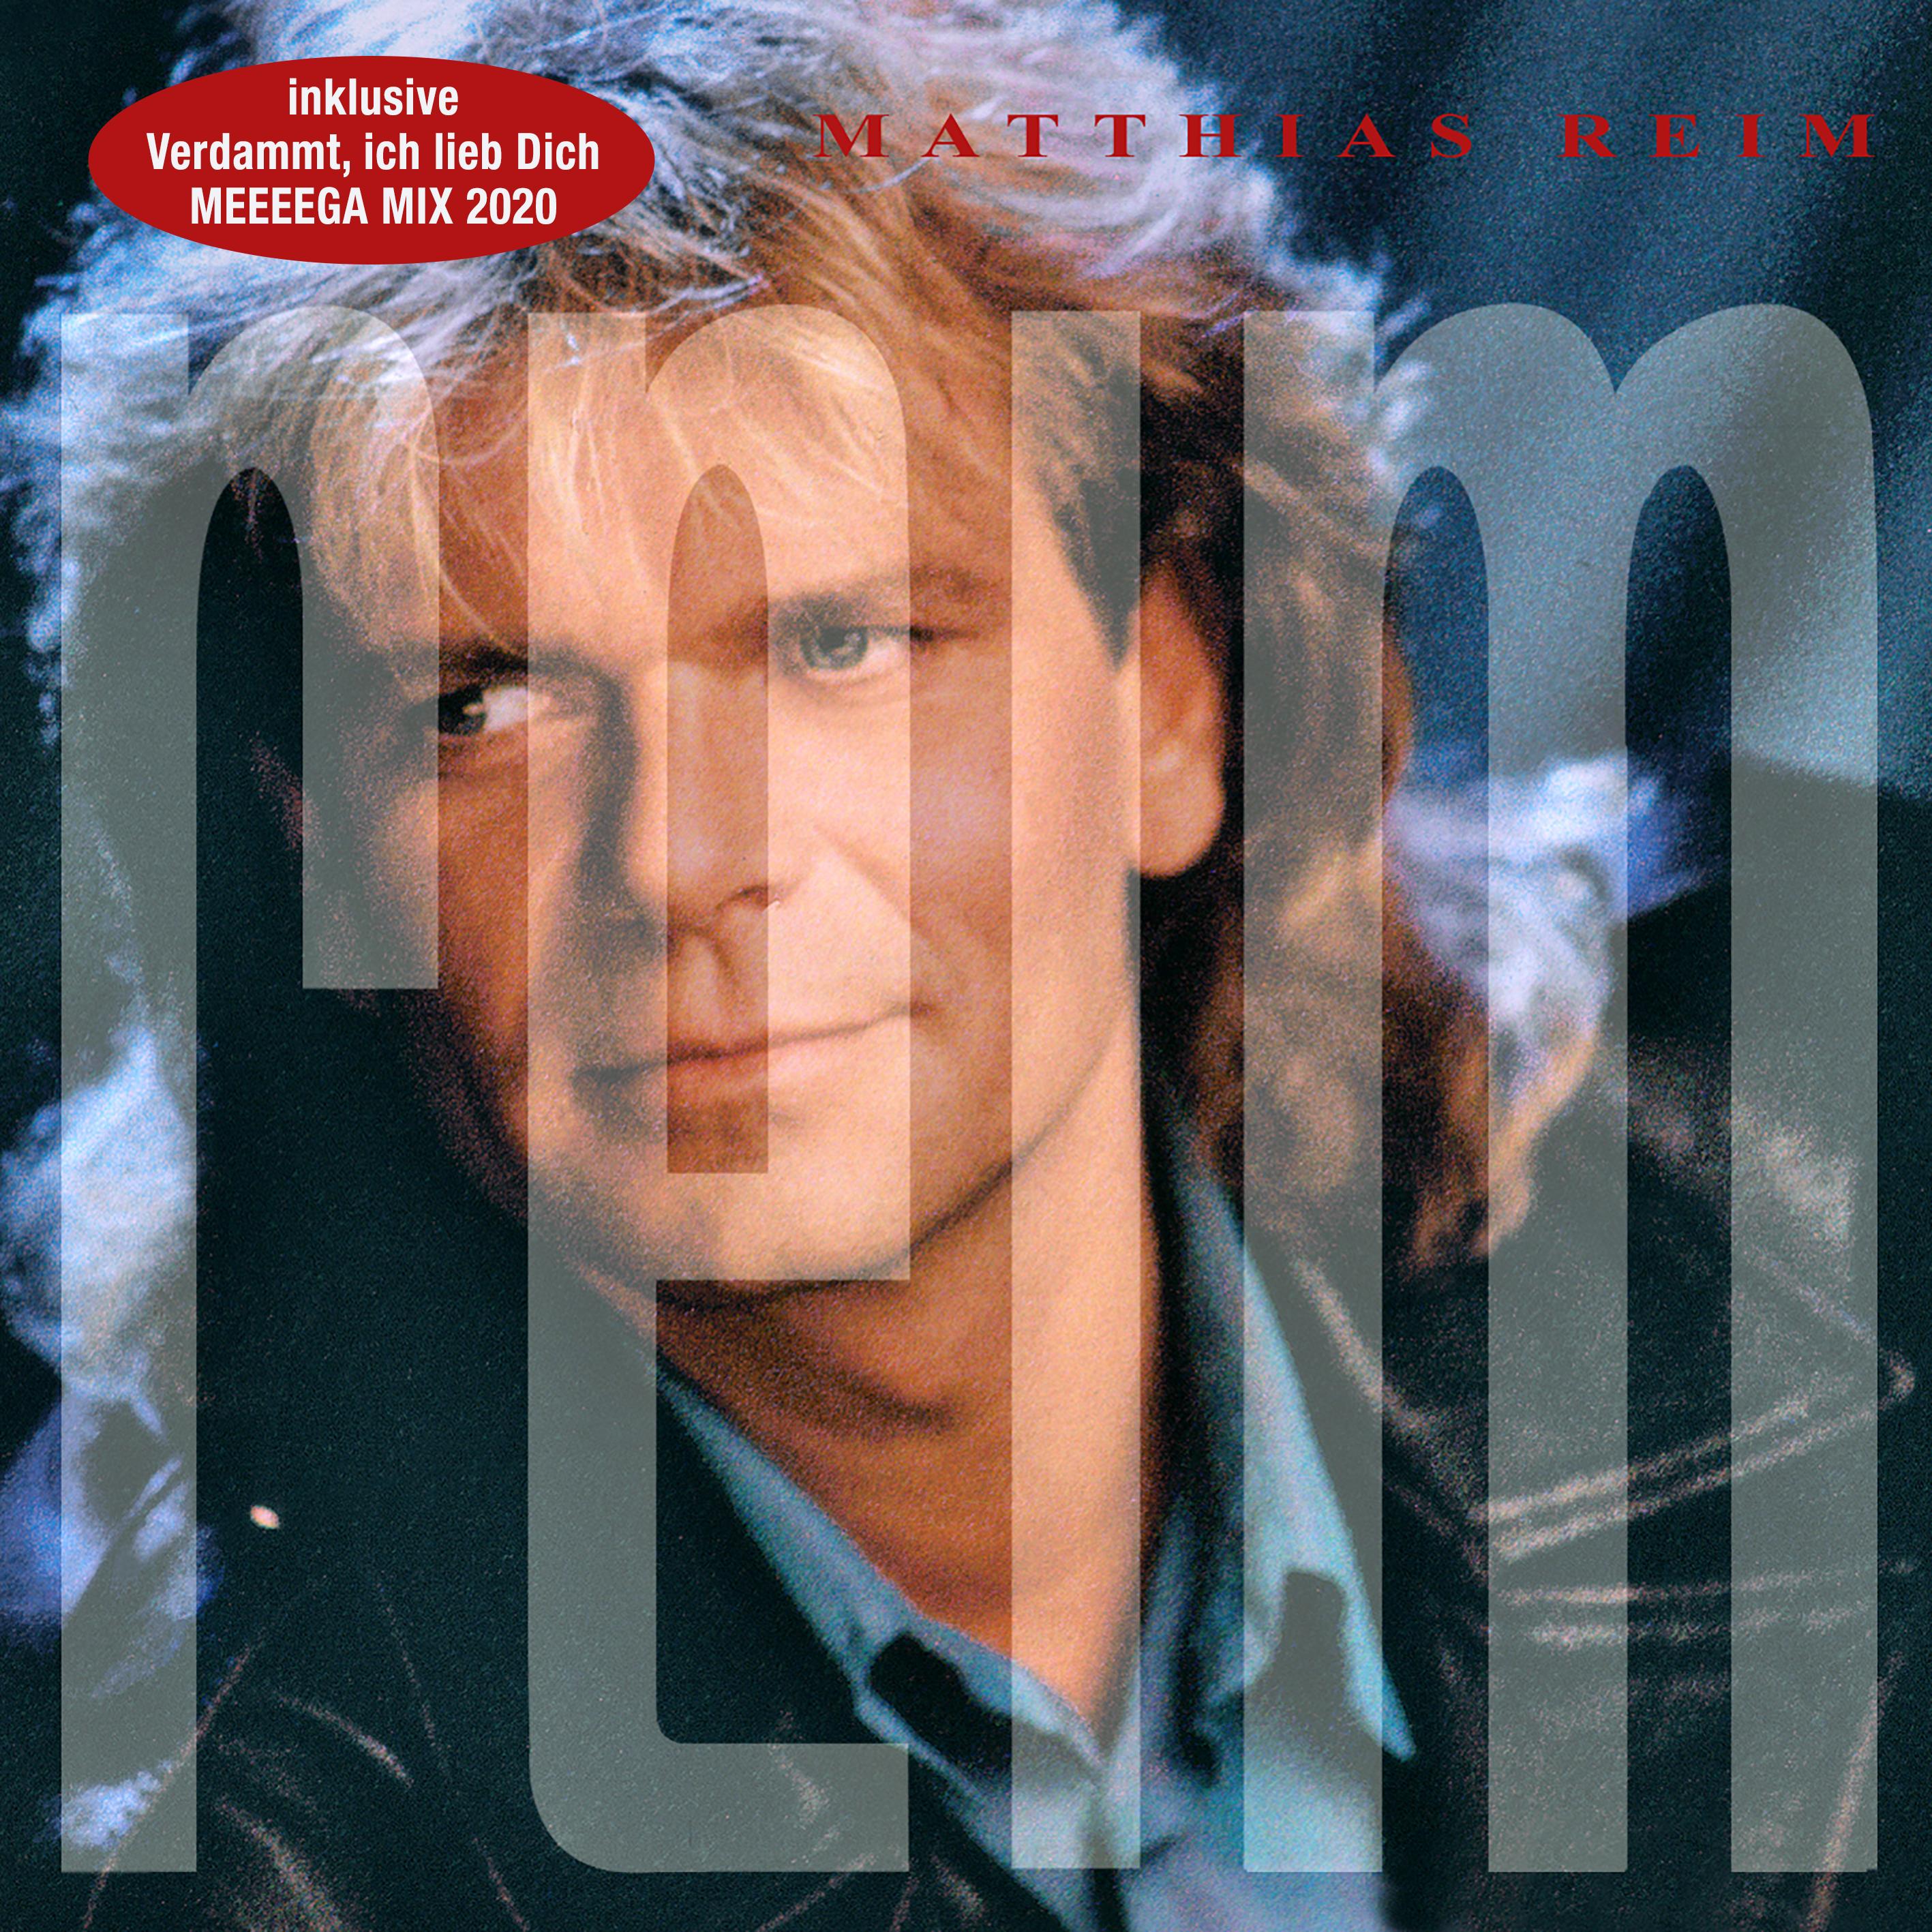 MATTHIAS REIM * 30 Jahre MATTHIAS REIM (Doppel-CD)